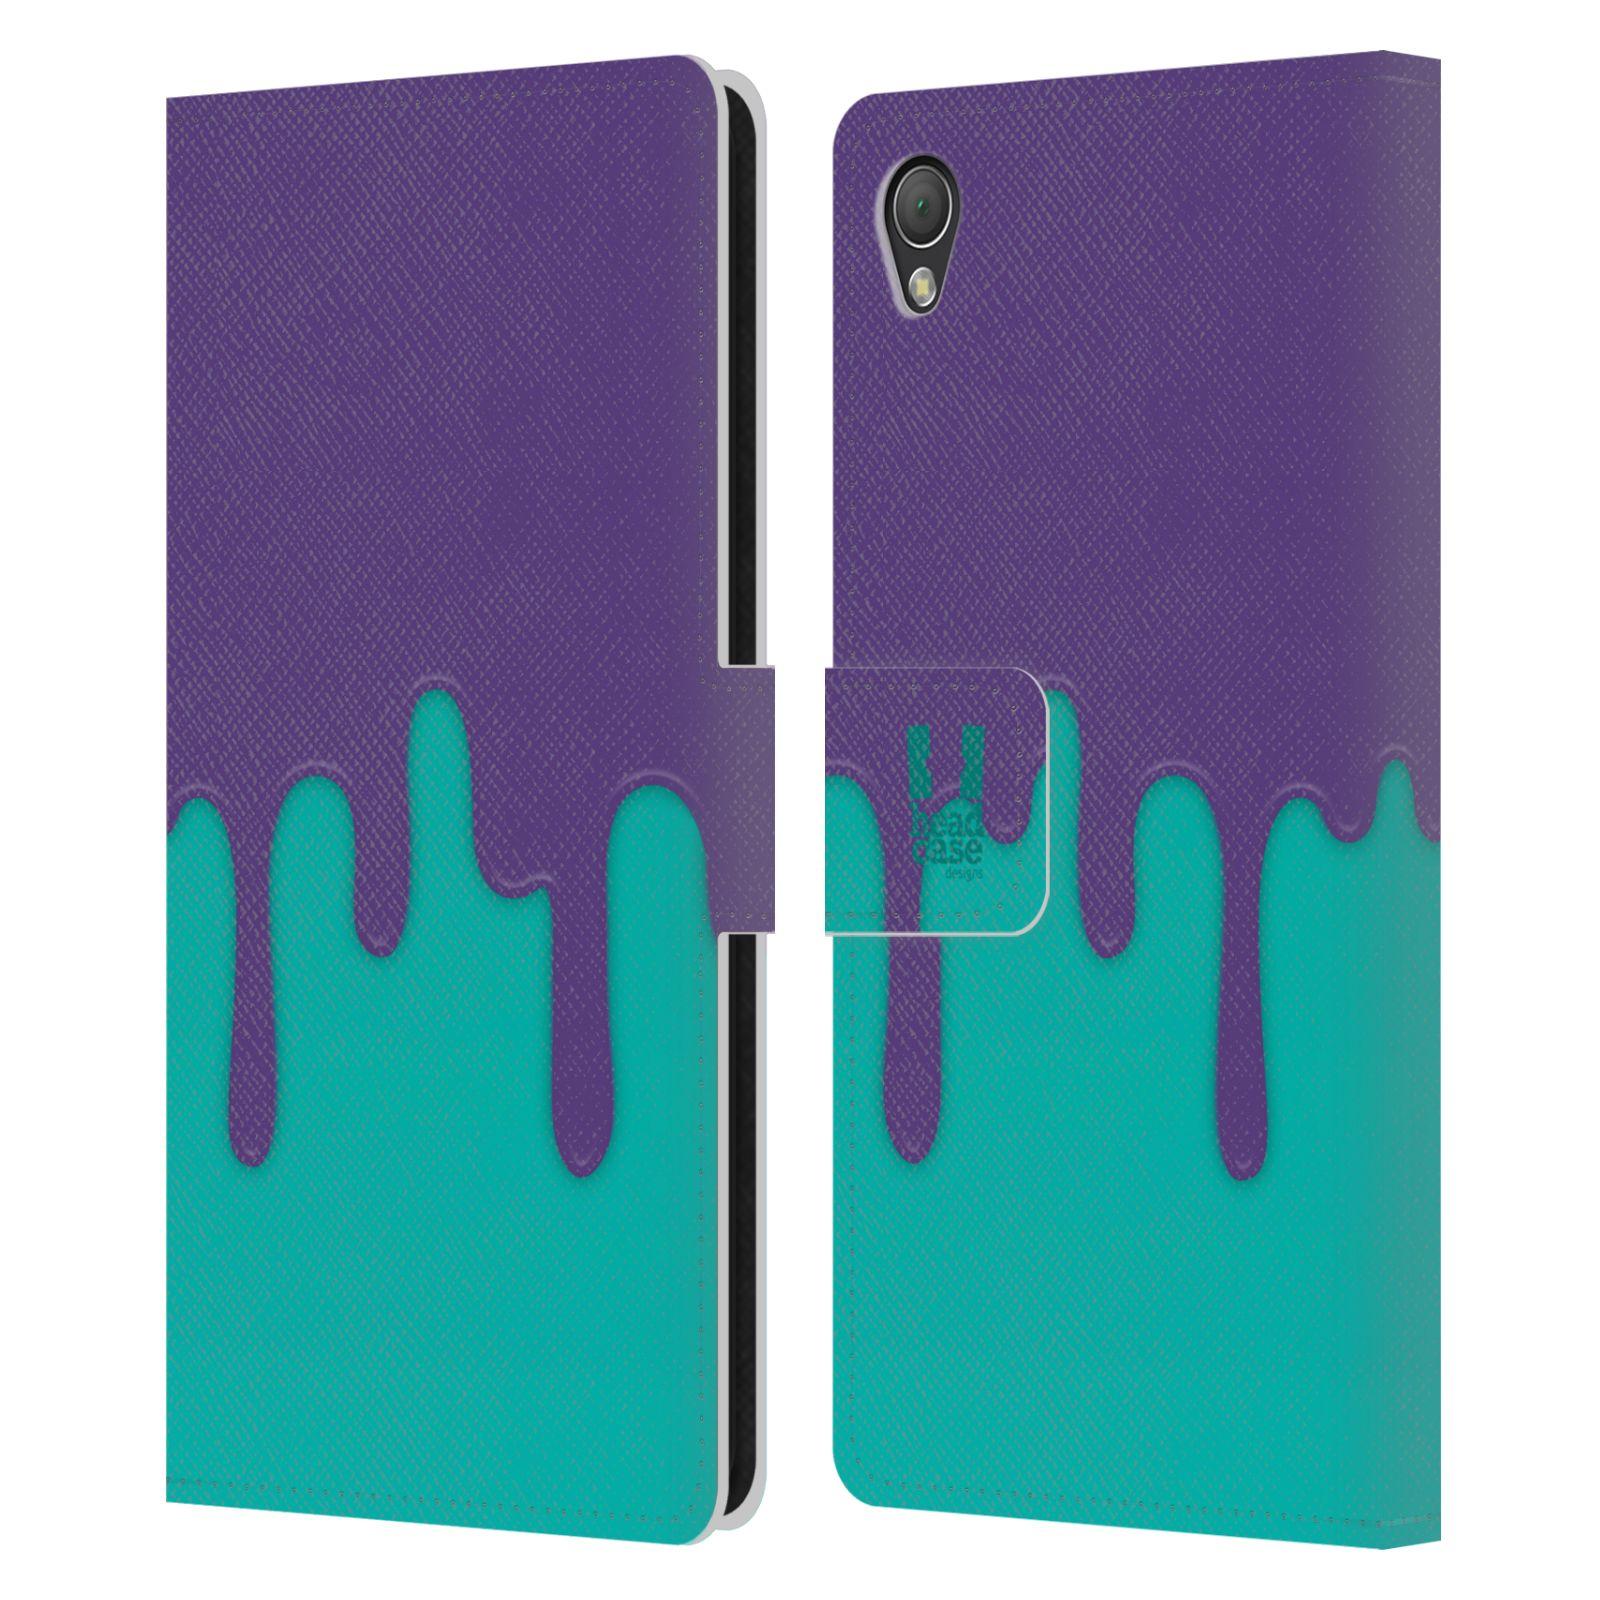 HEAD CASE Flipové pouzdro pro mobil SONY XPERIA Z3 Rozlitá barva fialová a tyrkysová